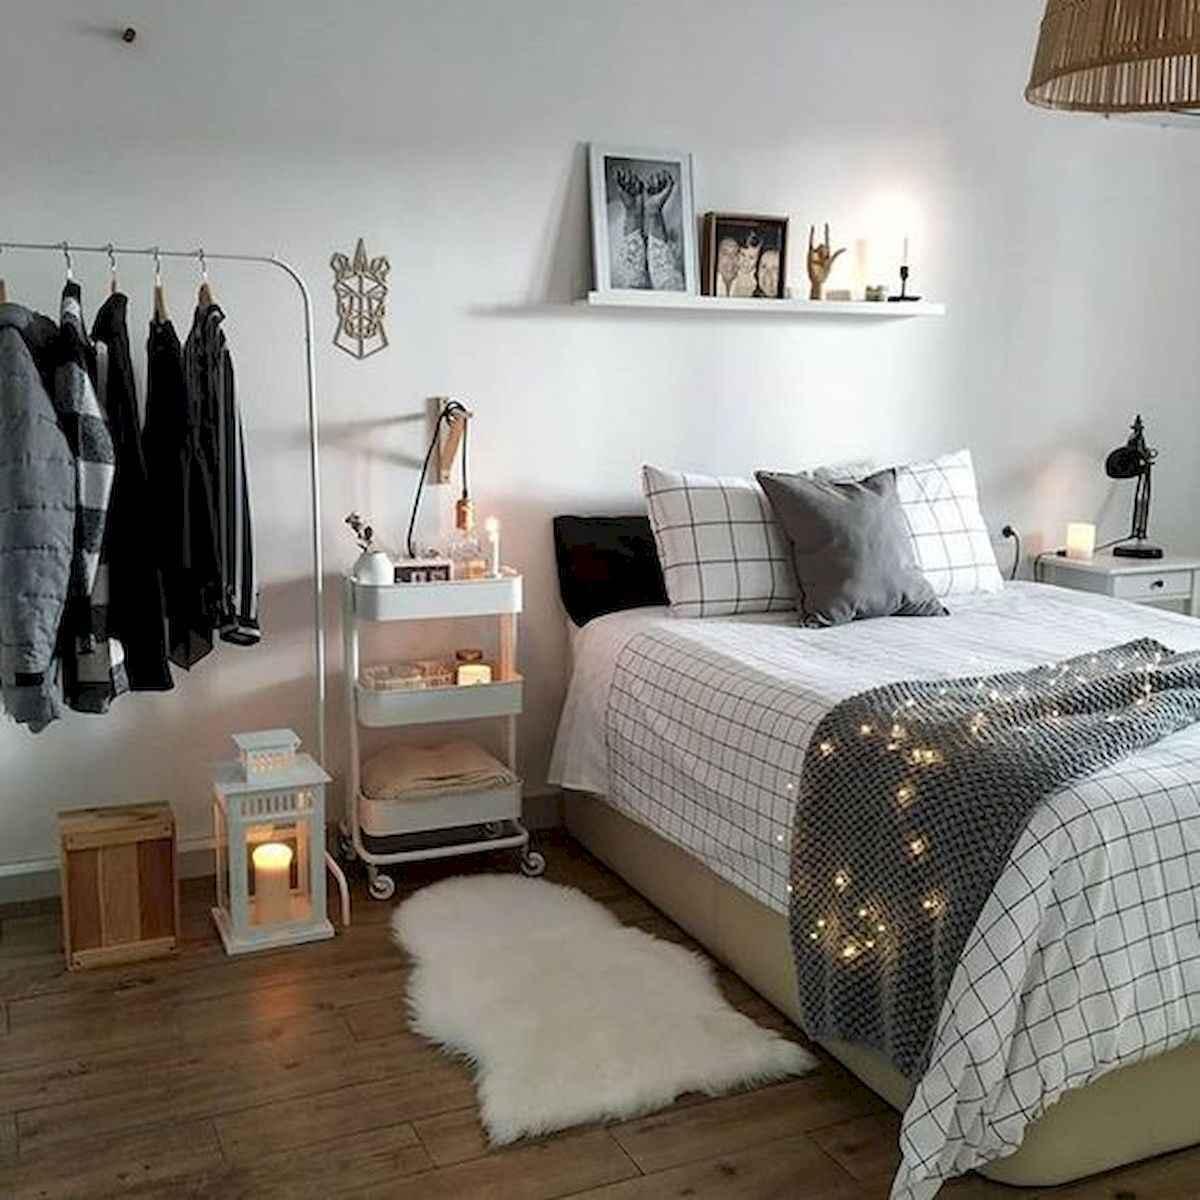 80 Fantastic Small Apartment Bedroom College Design Ideas and Decor (17)